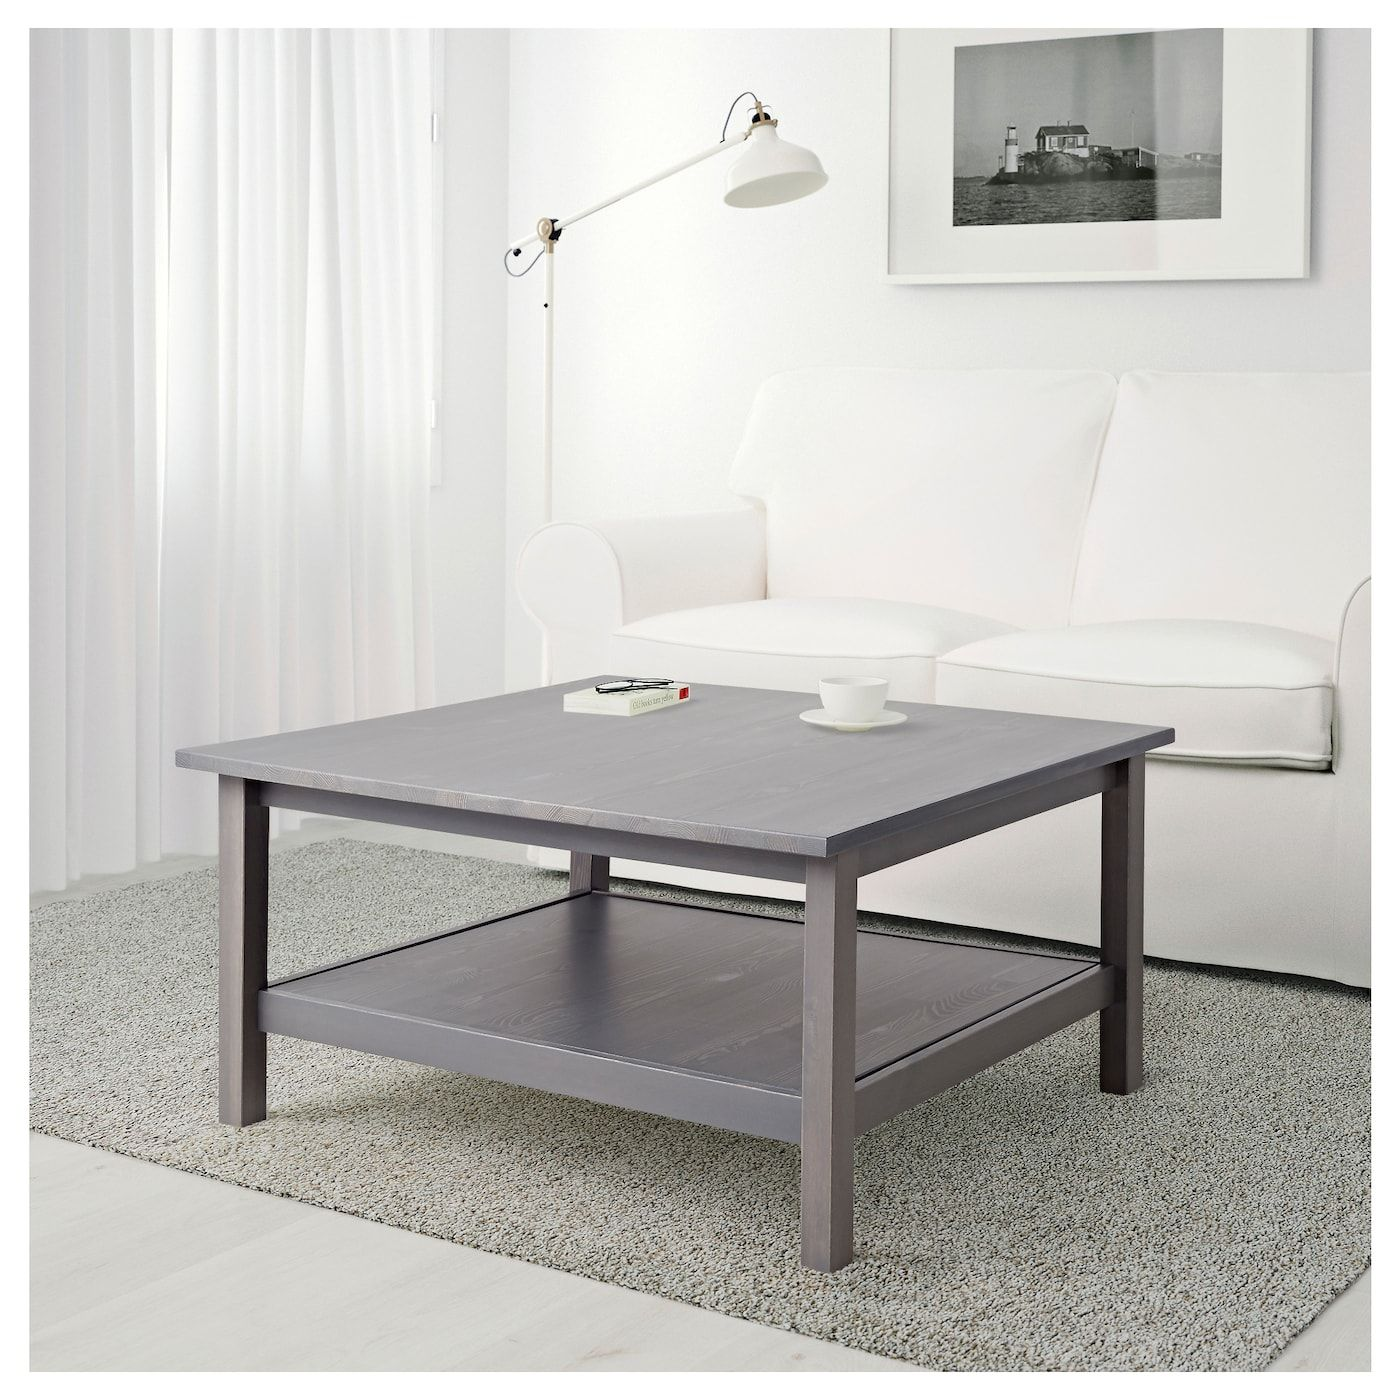 HEMNES Coffee table dark gray gray stained 35 3/8x35 3/8